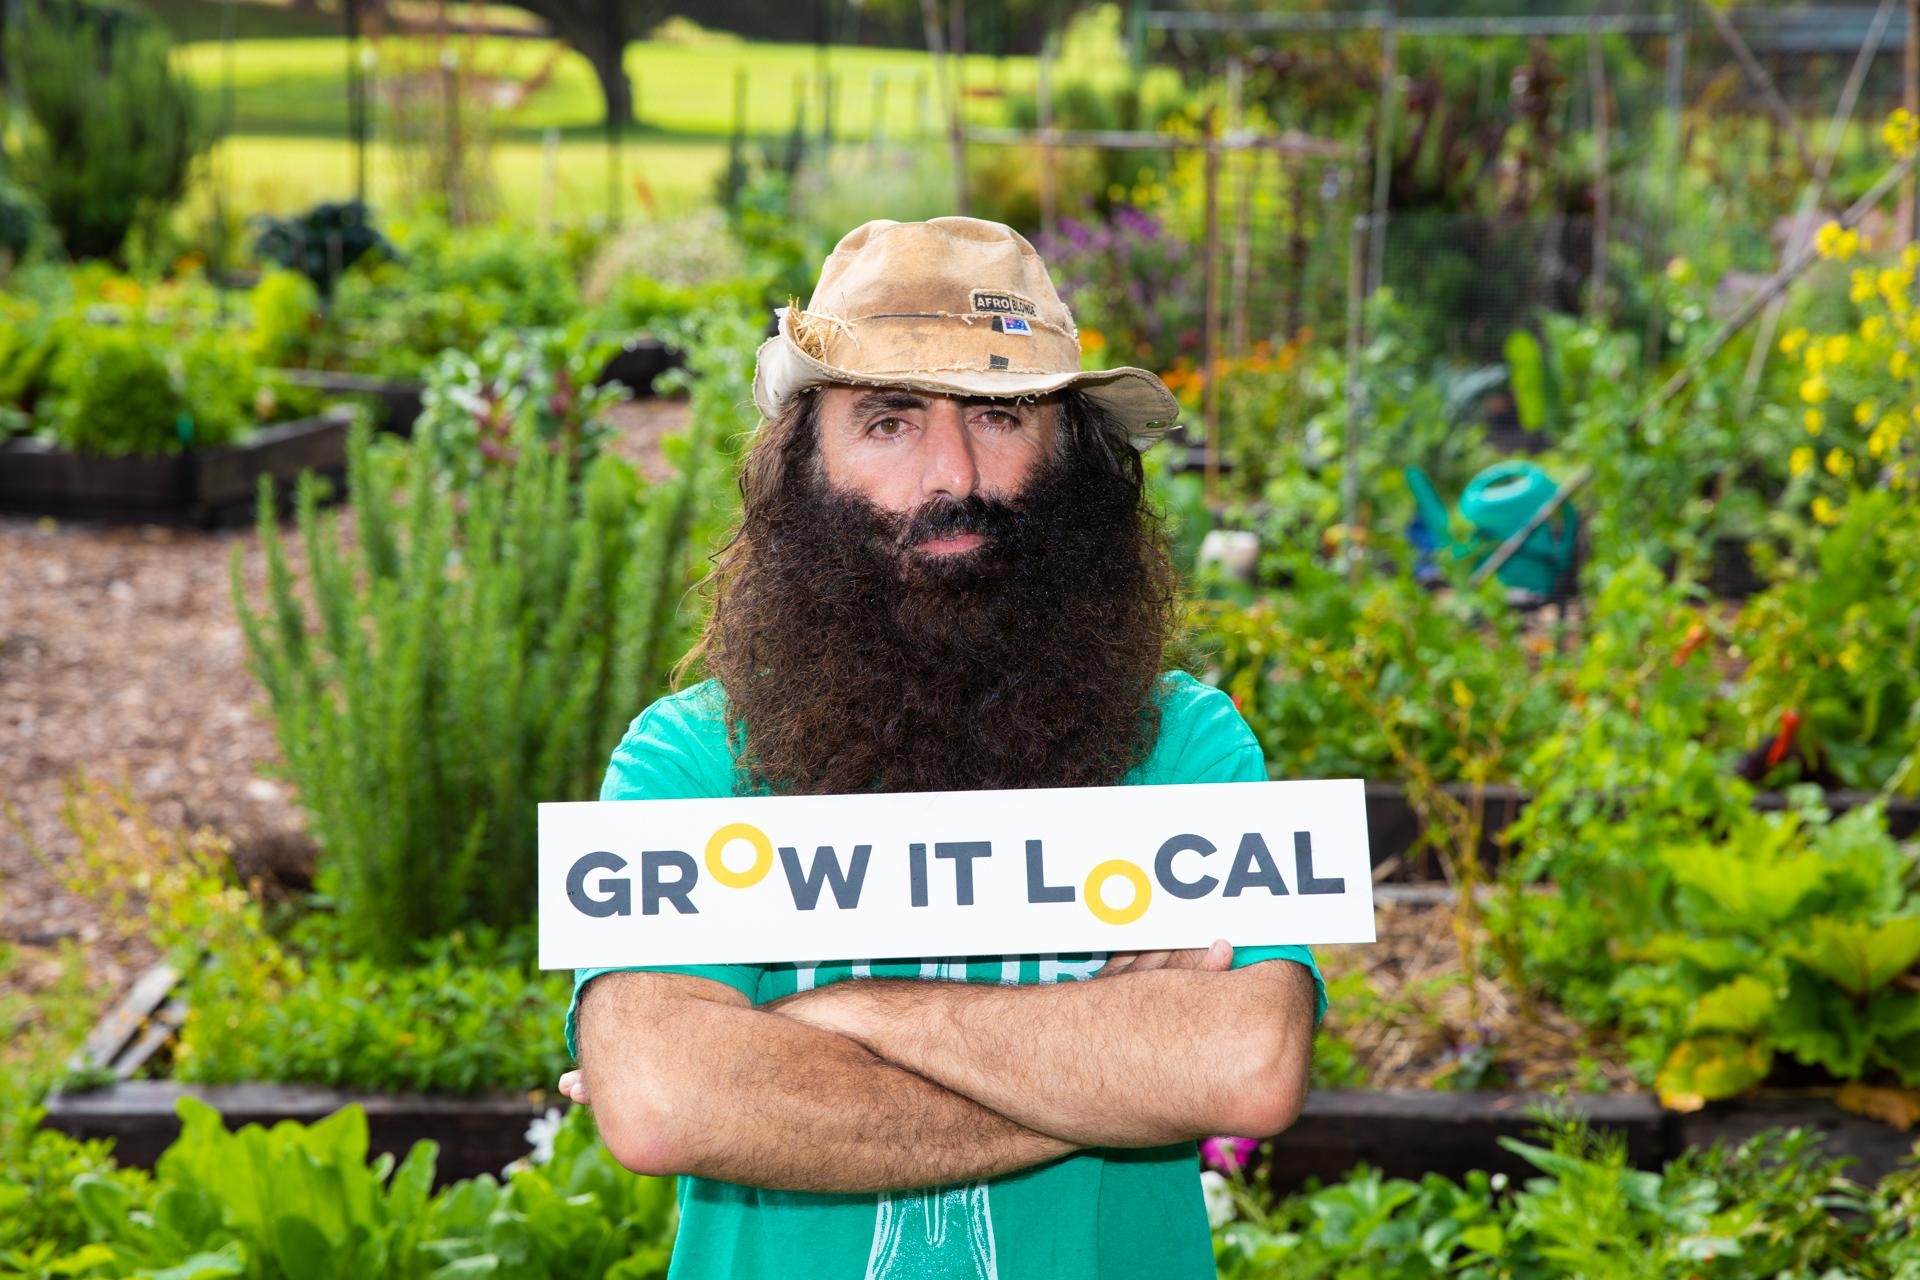 Grow It Local